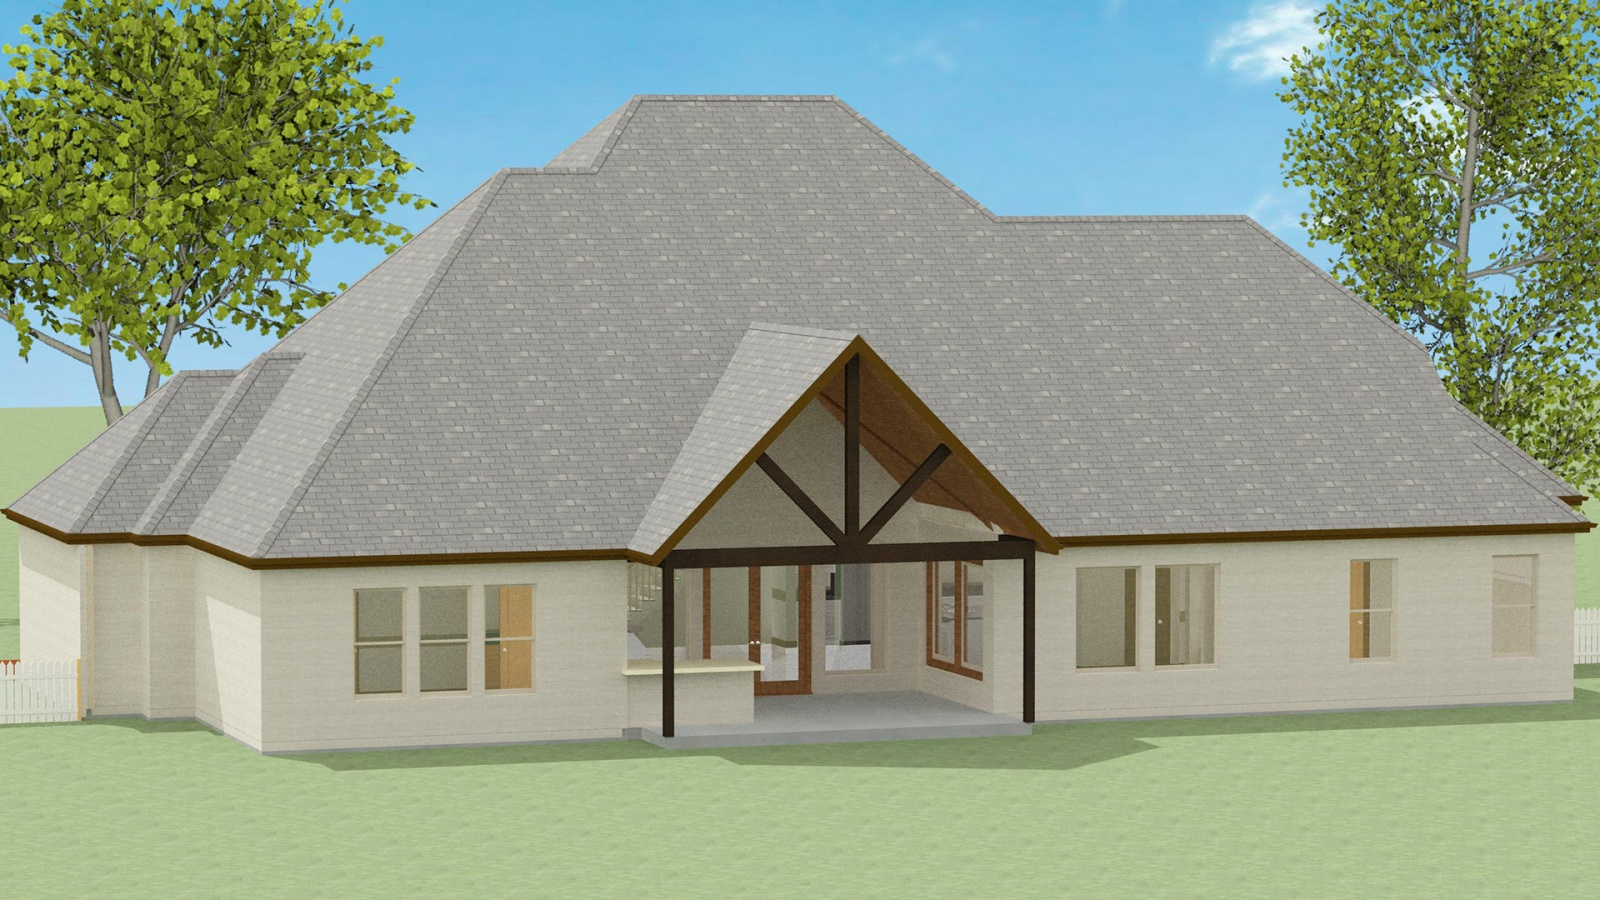 5 Bedrooms Bedrooms, ,6 BathroomsBathrooms,Custom Home,Home Plans,1060